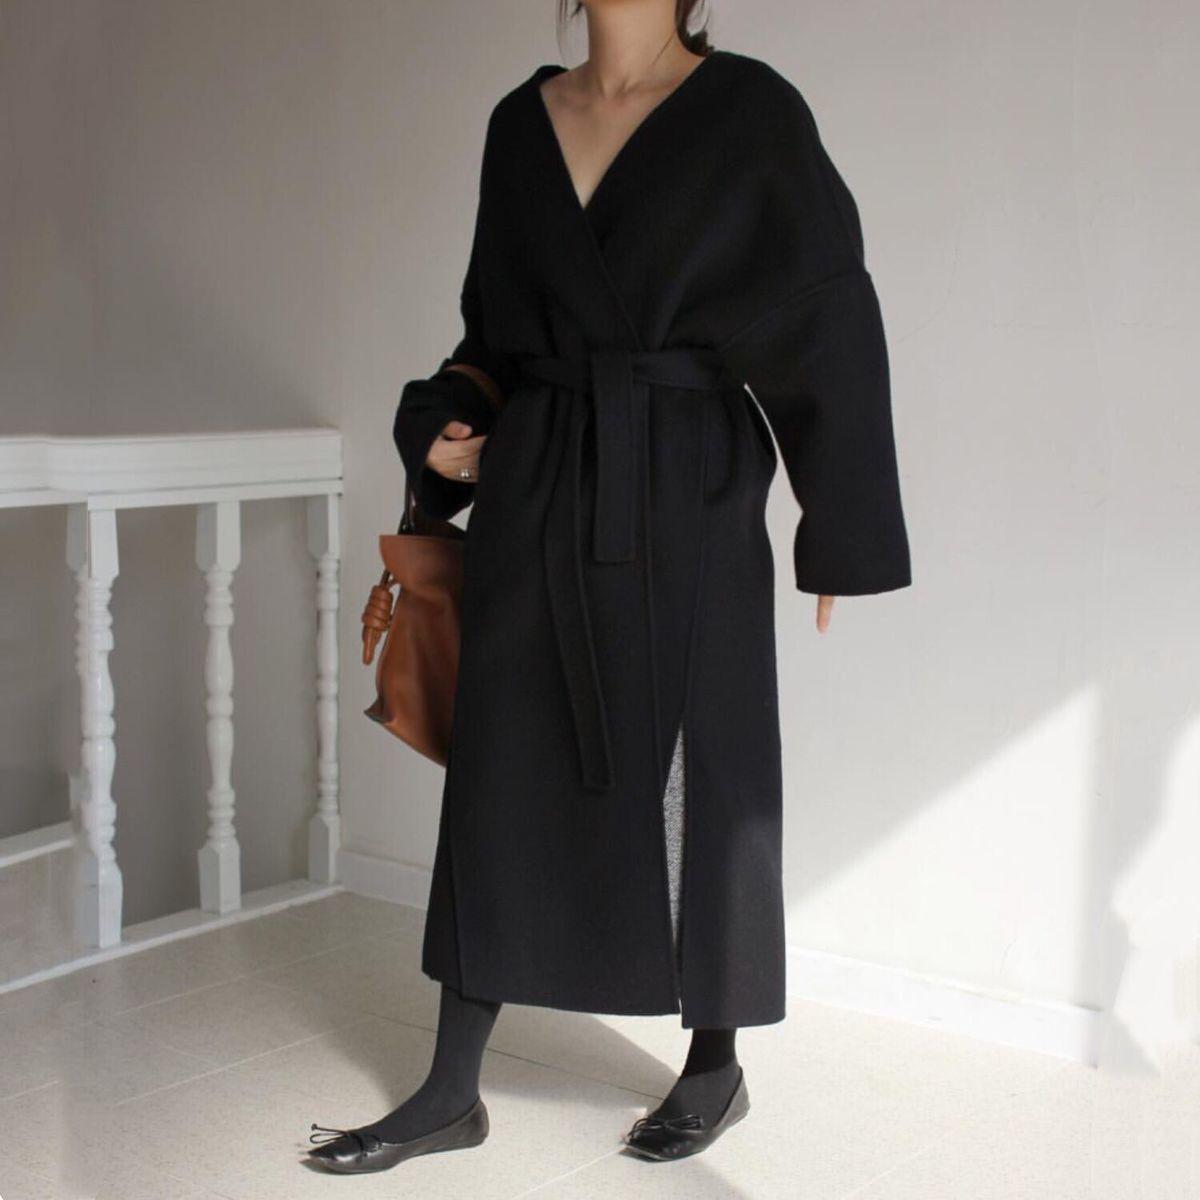 SHENGPALAE 2019 Black New Spring Windbreakers V Collar Long Sleeve Personality Waist Tie Korean Fashion Women